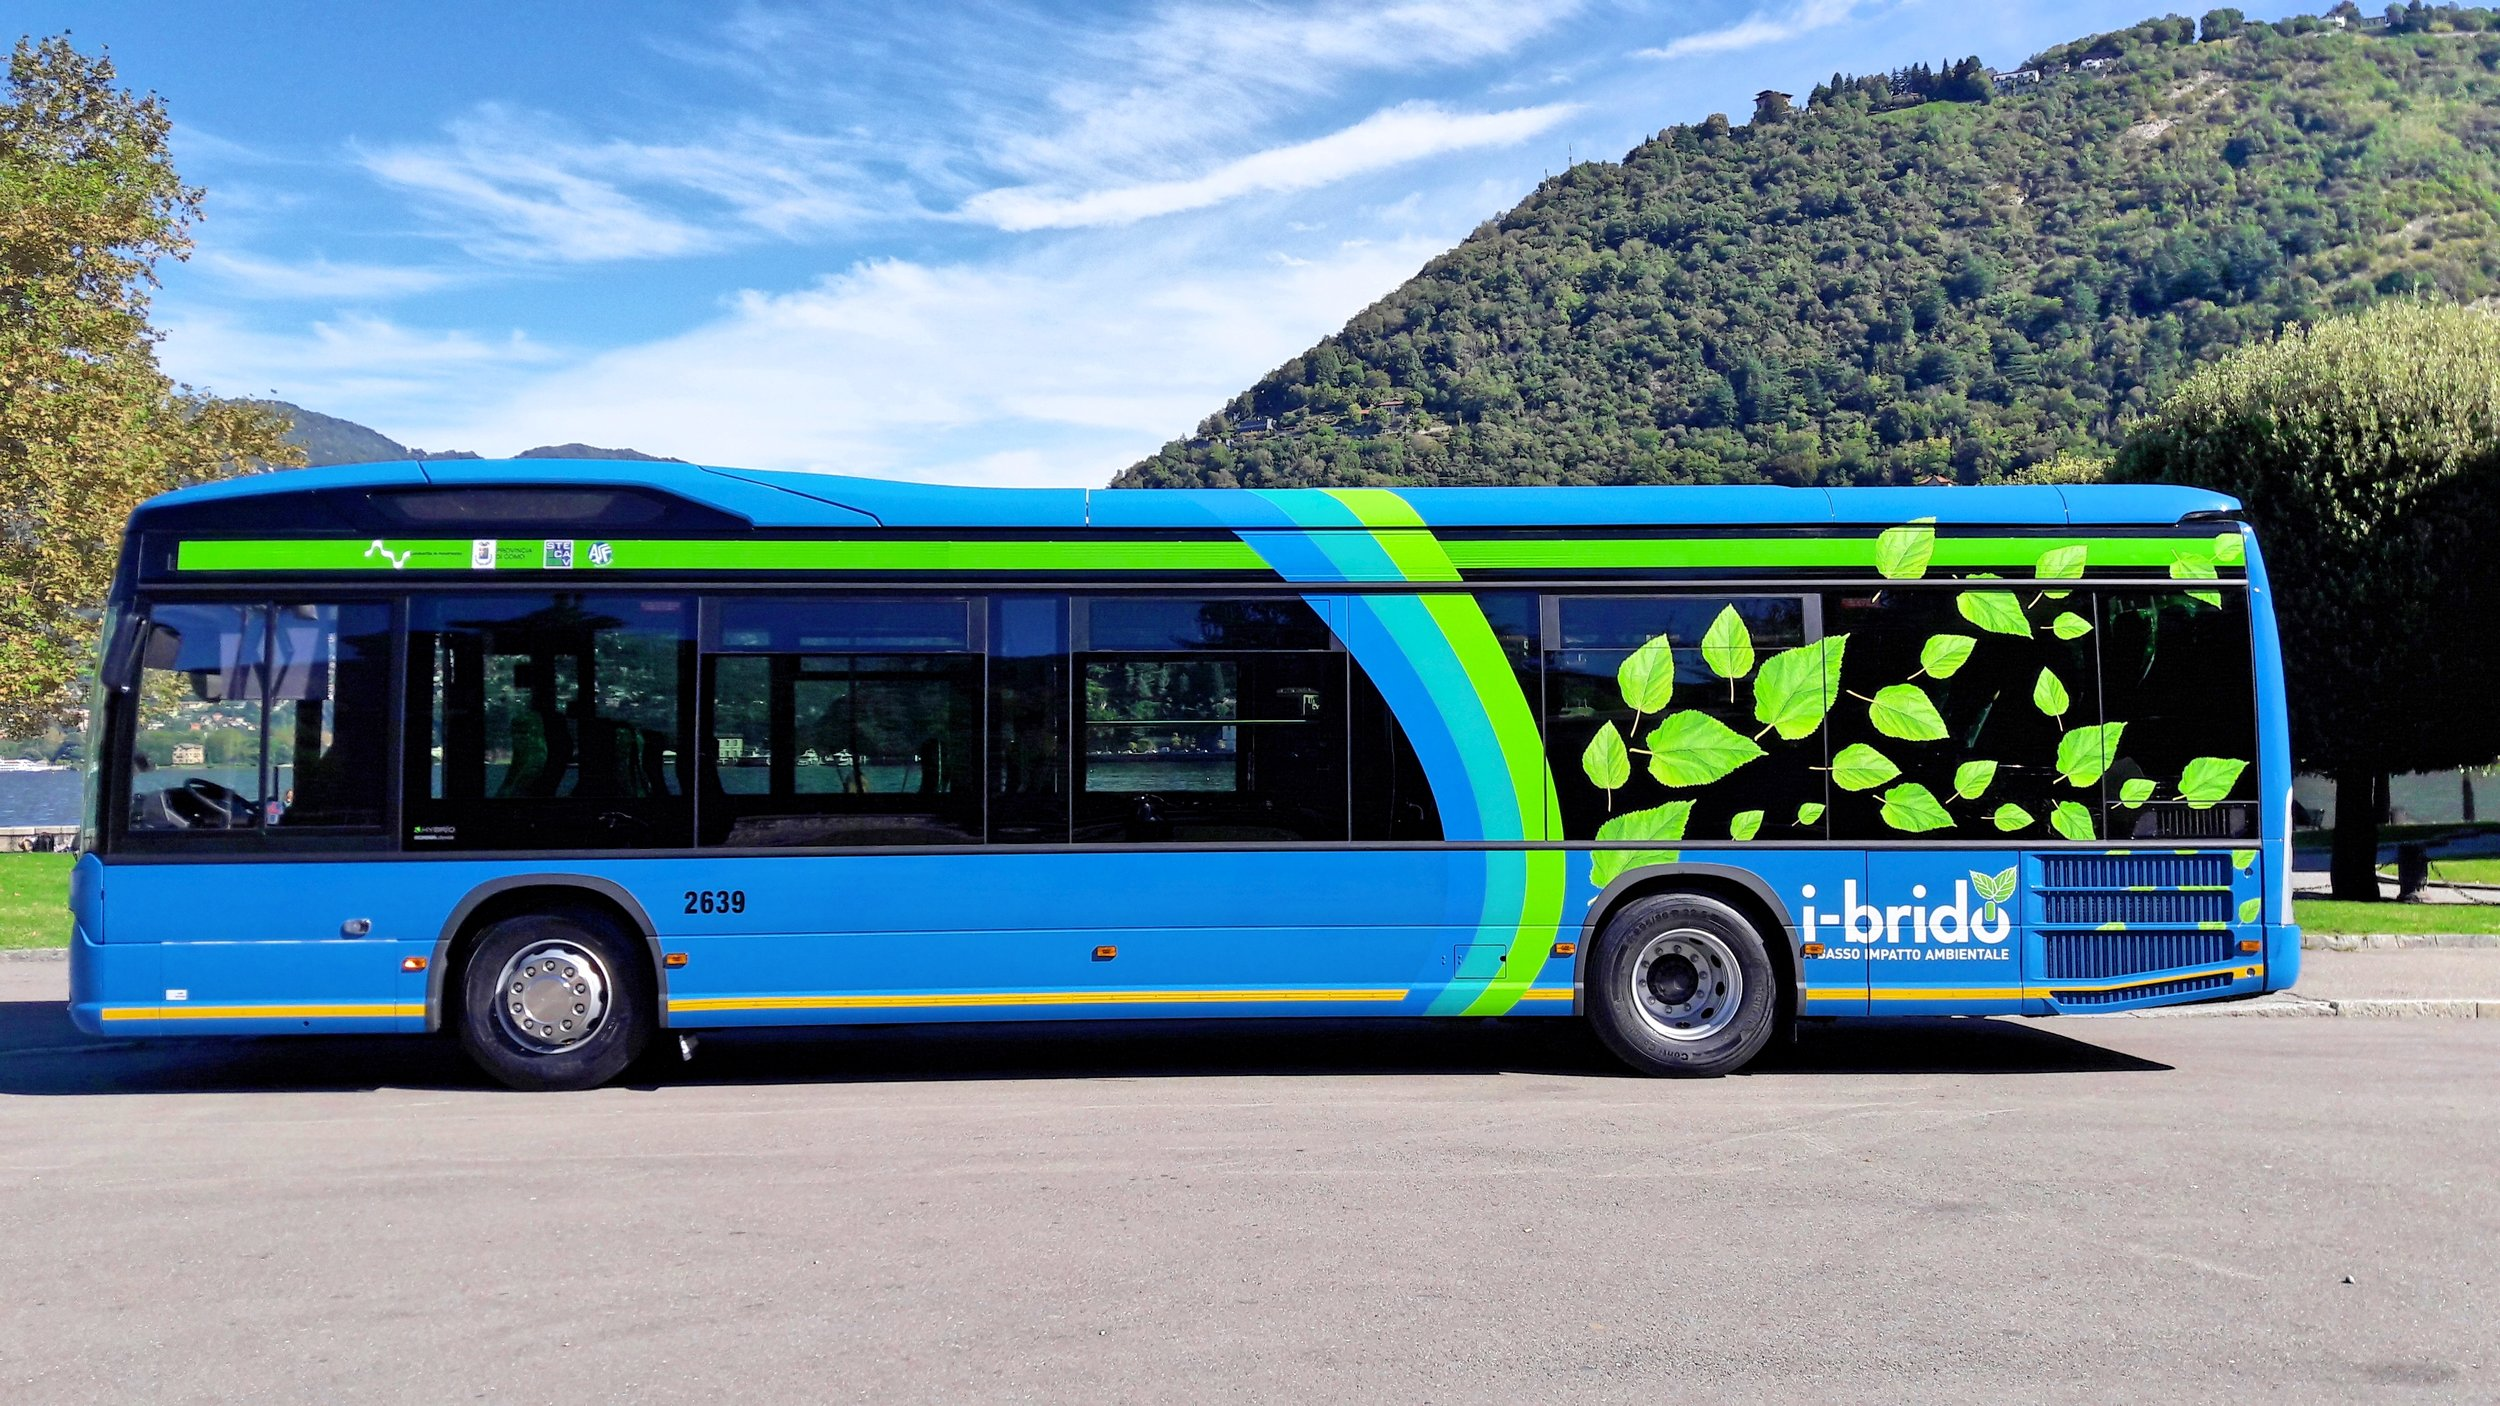 Bus asf via trasporti-italia_Fotor.jpg